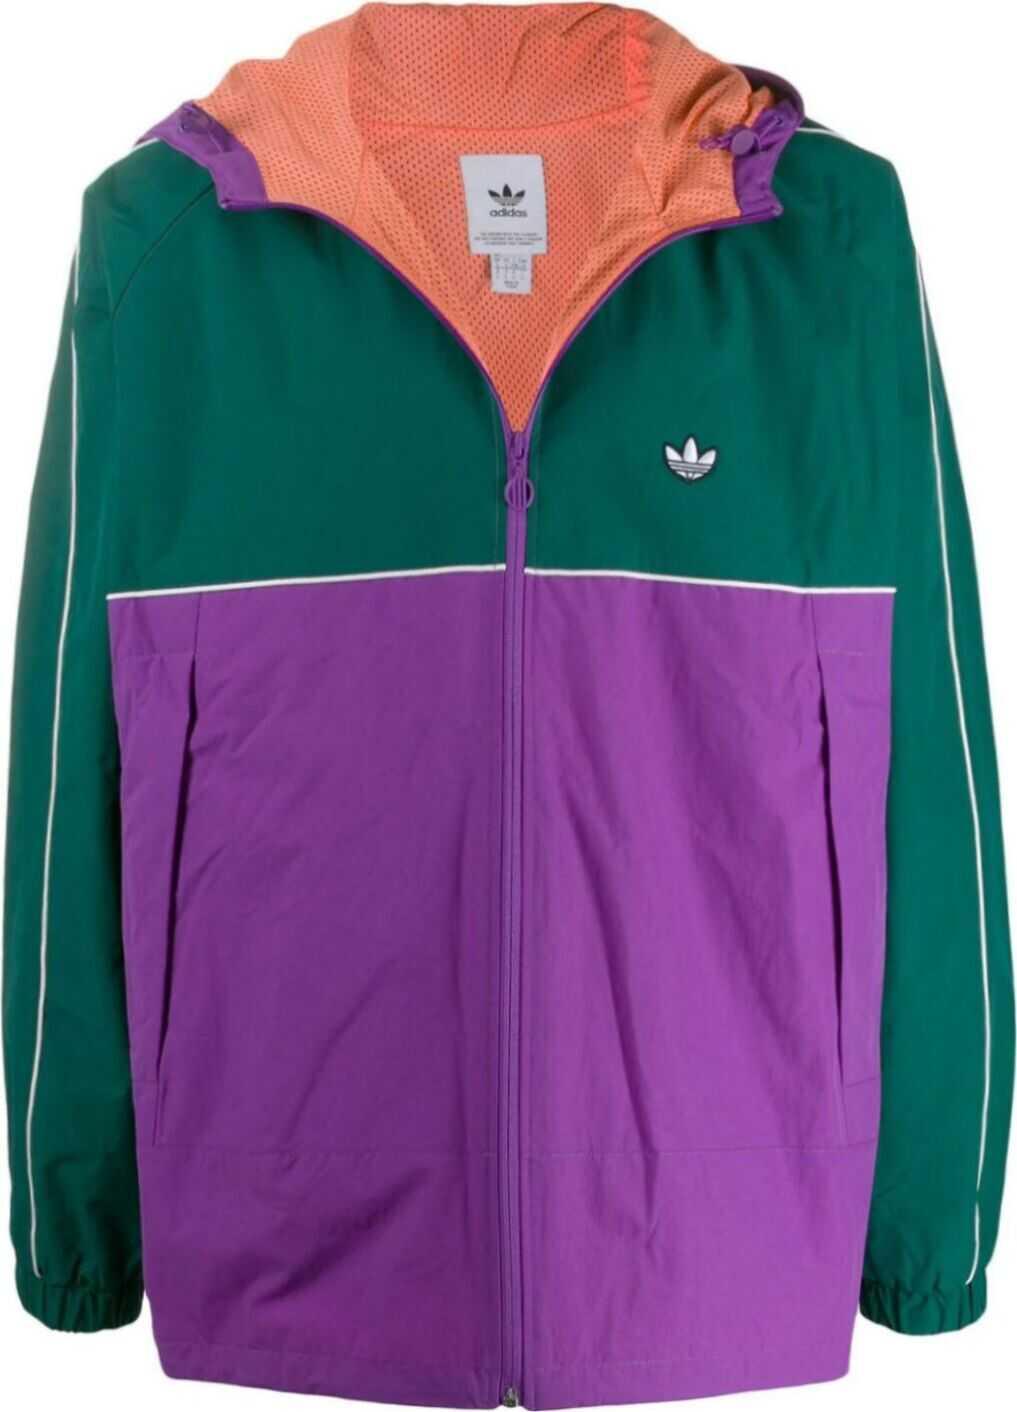 adidas Polyamide Outerwear Jacket PURPLE